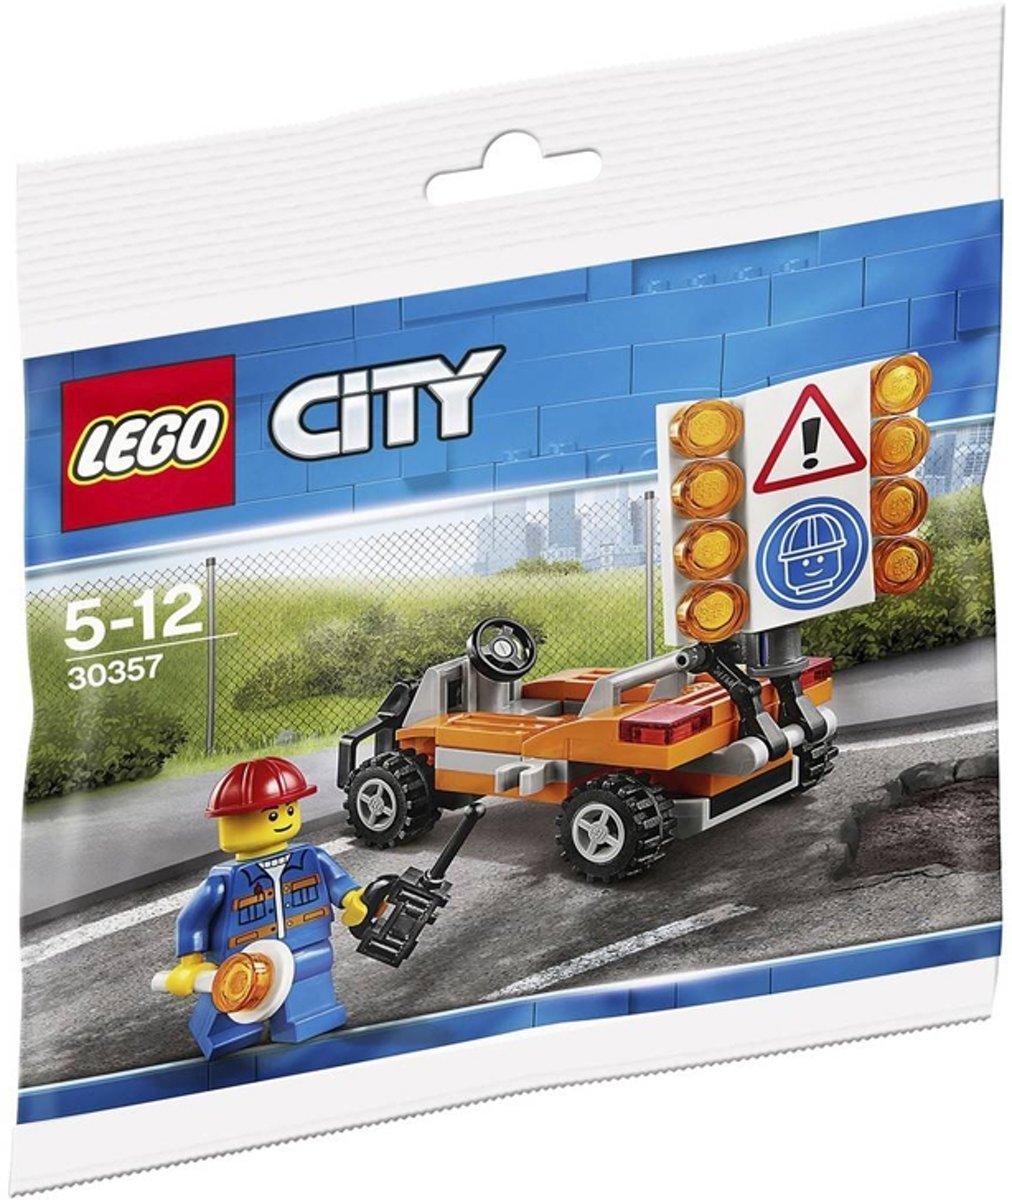 LEGO City 30357 Wegwerker (Lego zakje)